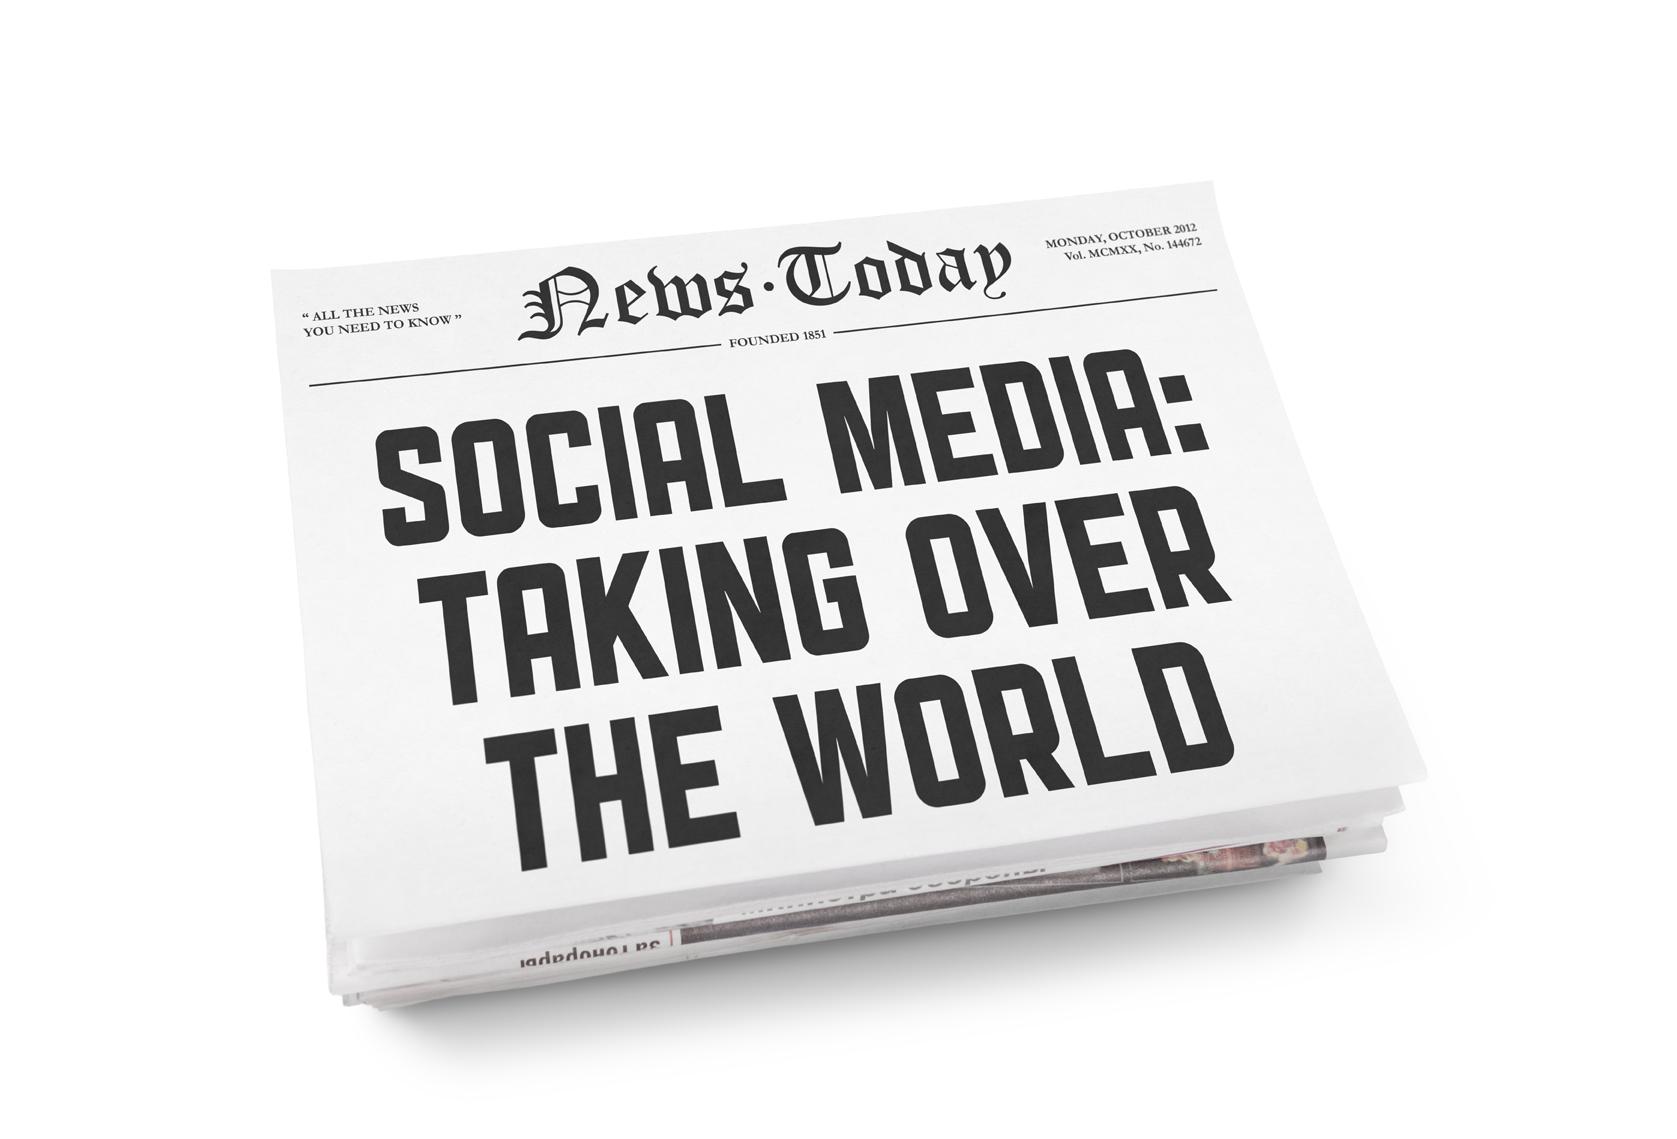 Titular-redes-sociales